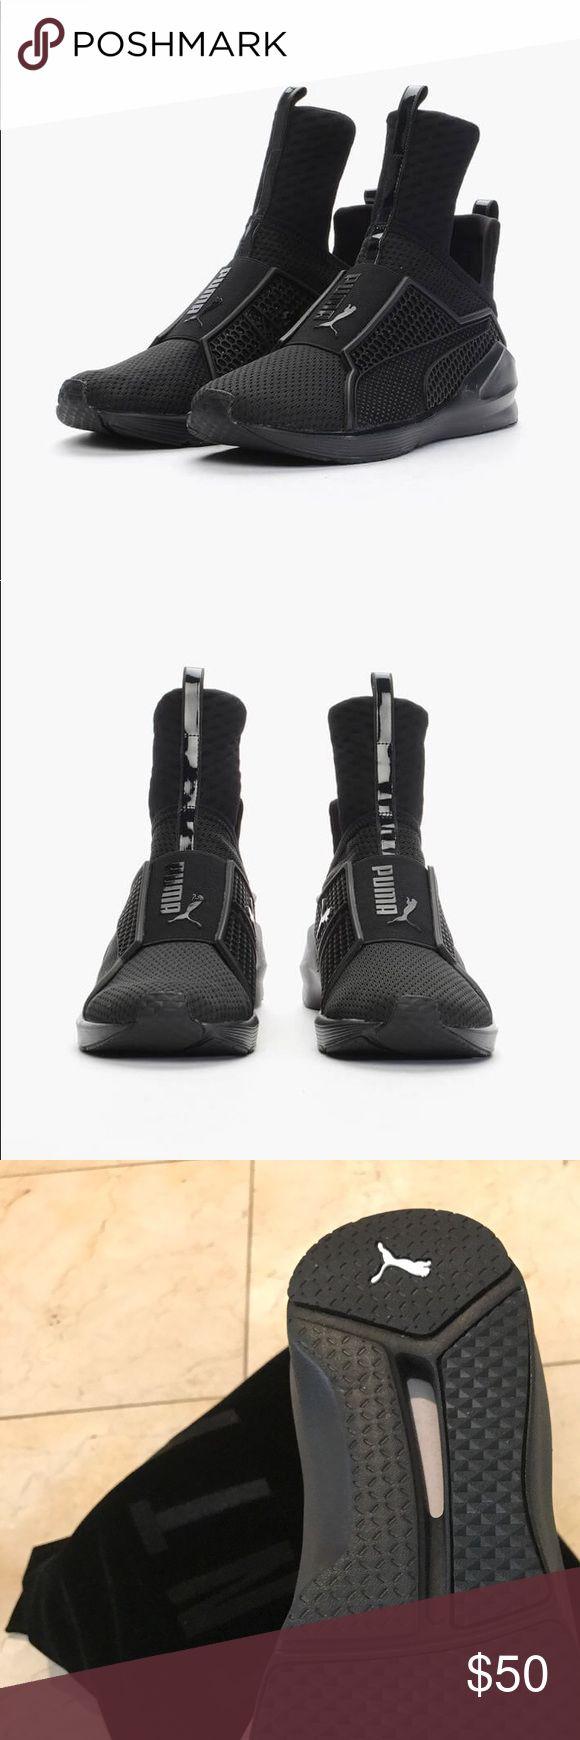 FENTY puma fierce Rihanna Never worn includes velvet dust bag Shoes Sneakers